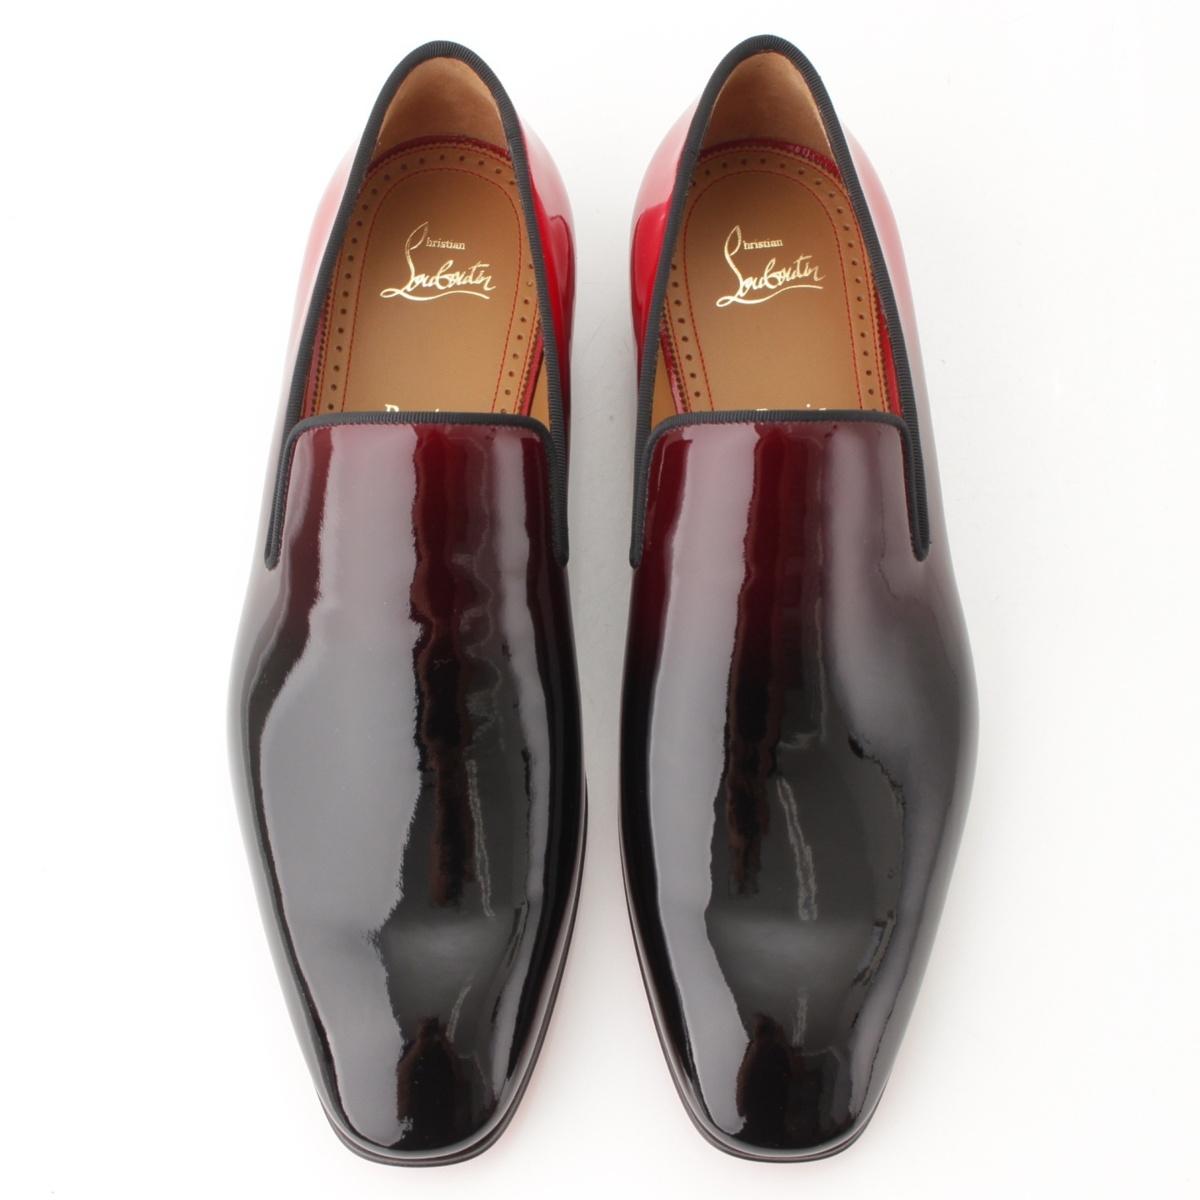 finest selection bf609 a819e Christian Louboutin act product Dandelion Flat men patent flattie black X  red 42-free 61658